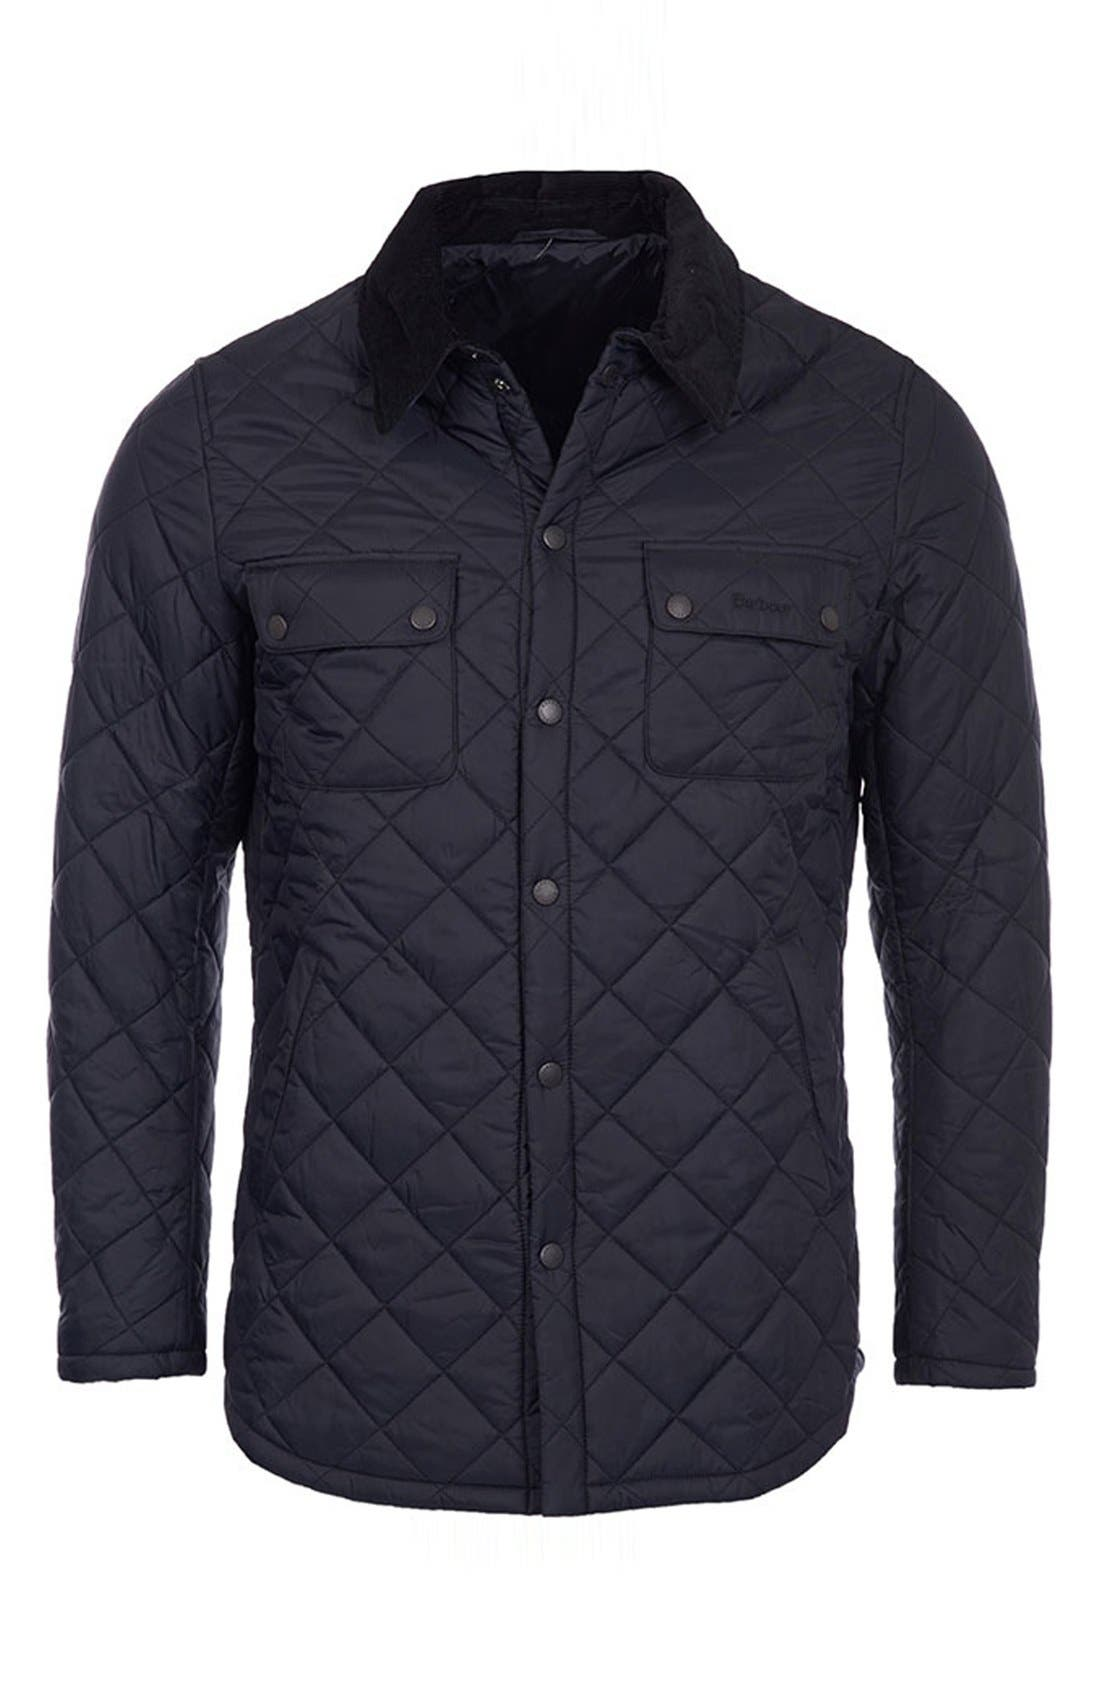 'Akenside' Regular Fit Quilted Jacket,                             Main thumbnail 1, color,                             001